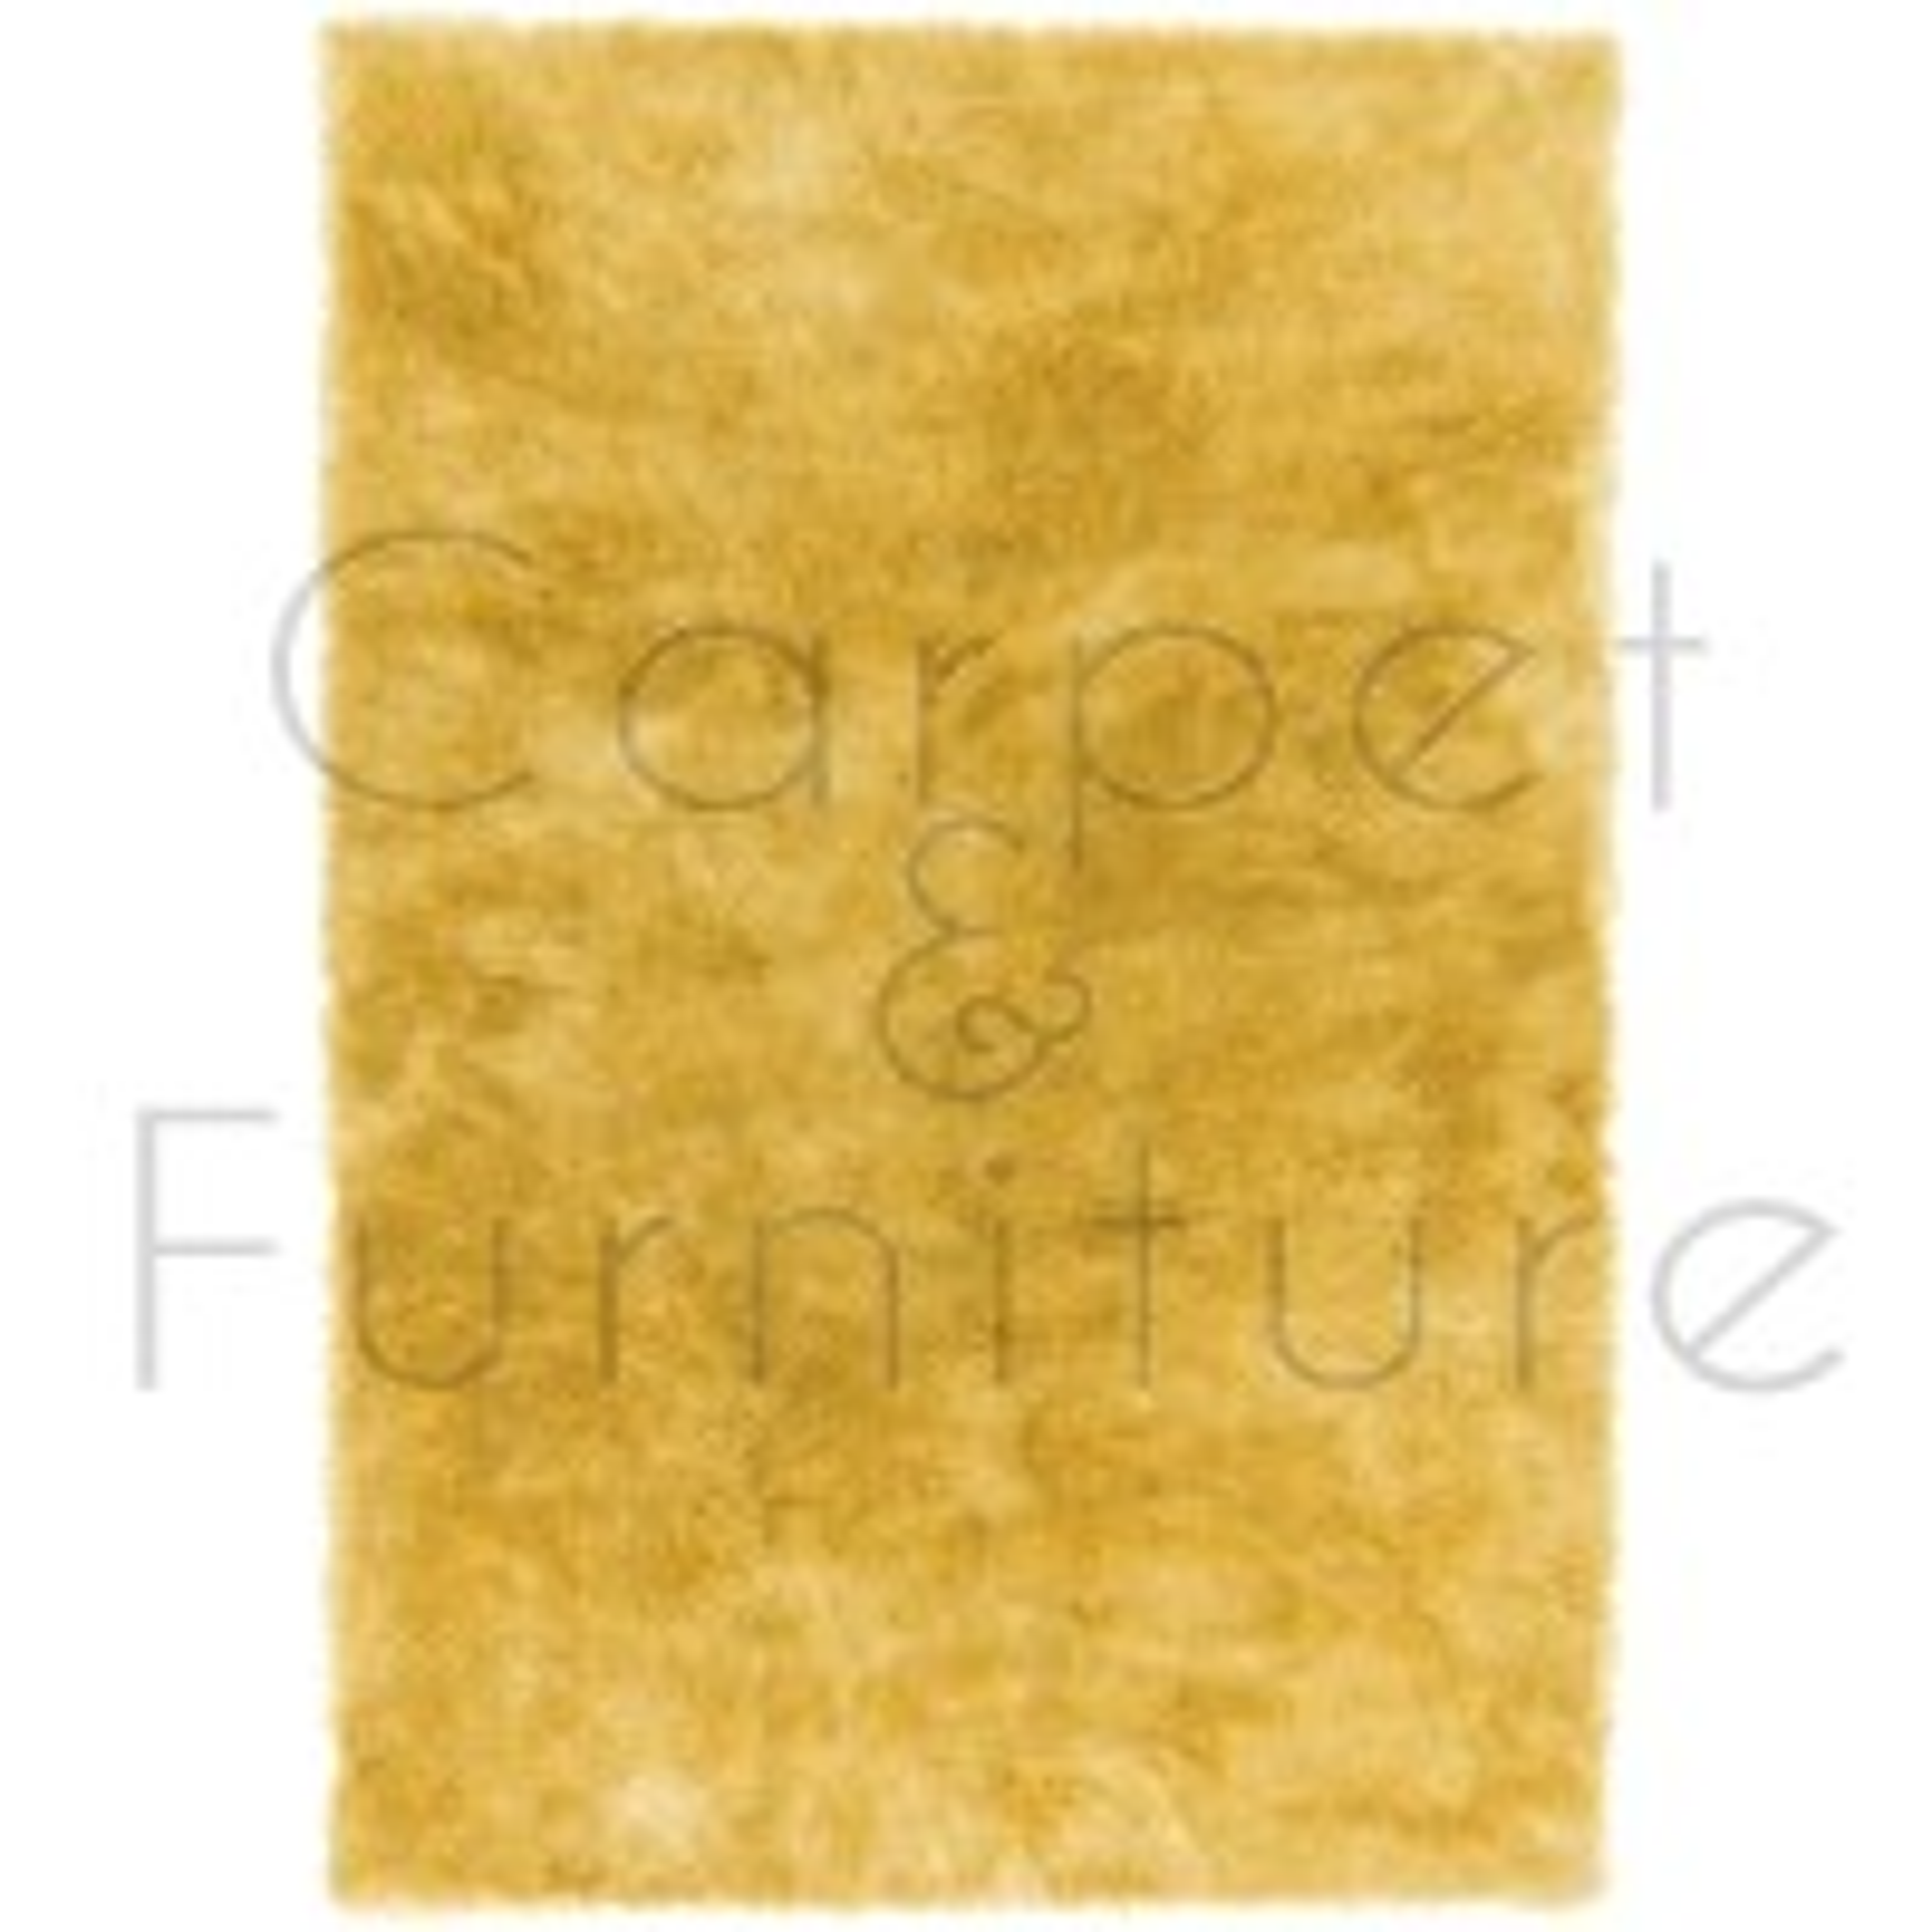 "Whisper Shaggy Rug - Yellow - Size 200 x 300 cm (6'7"" x 9'10"")"